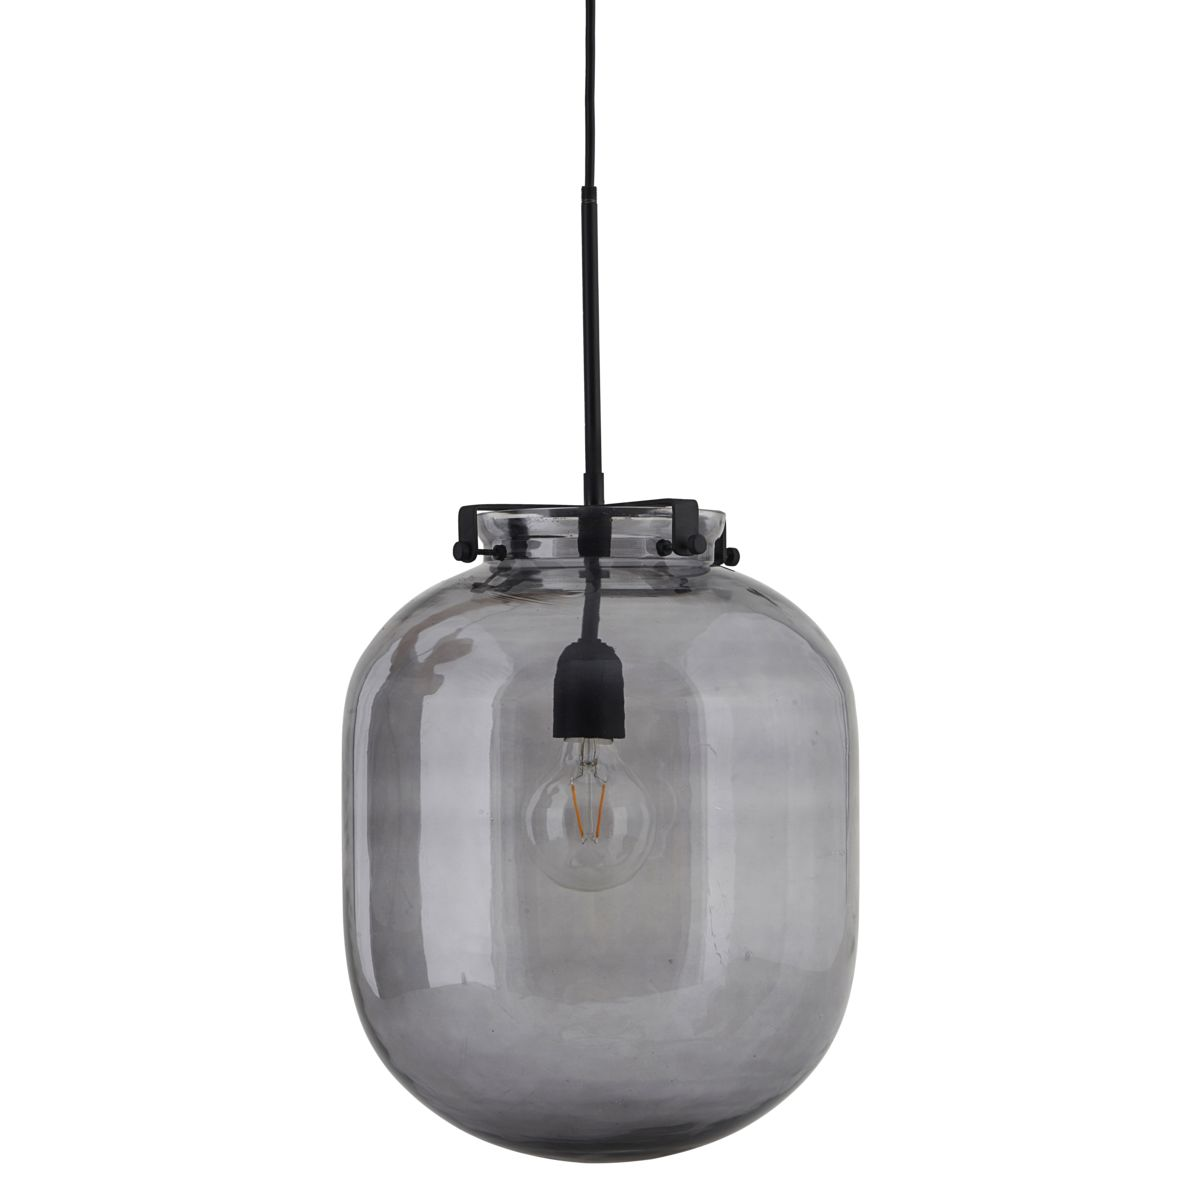 HOUSE DOCTOR Ball loftslampe - grt glas og sort metal, oval ( 30)